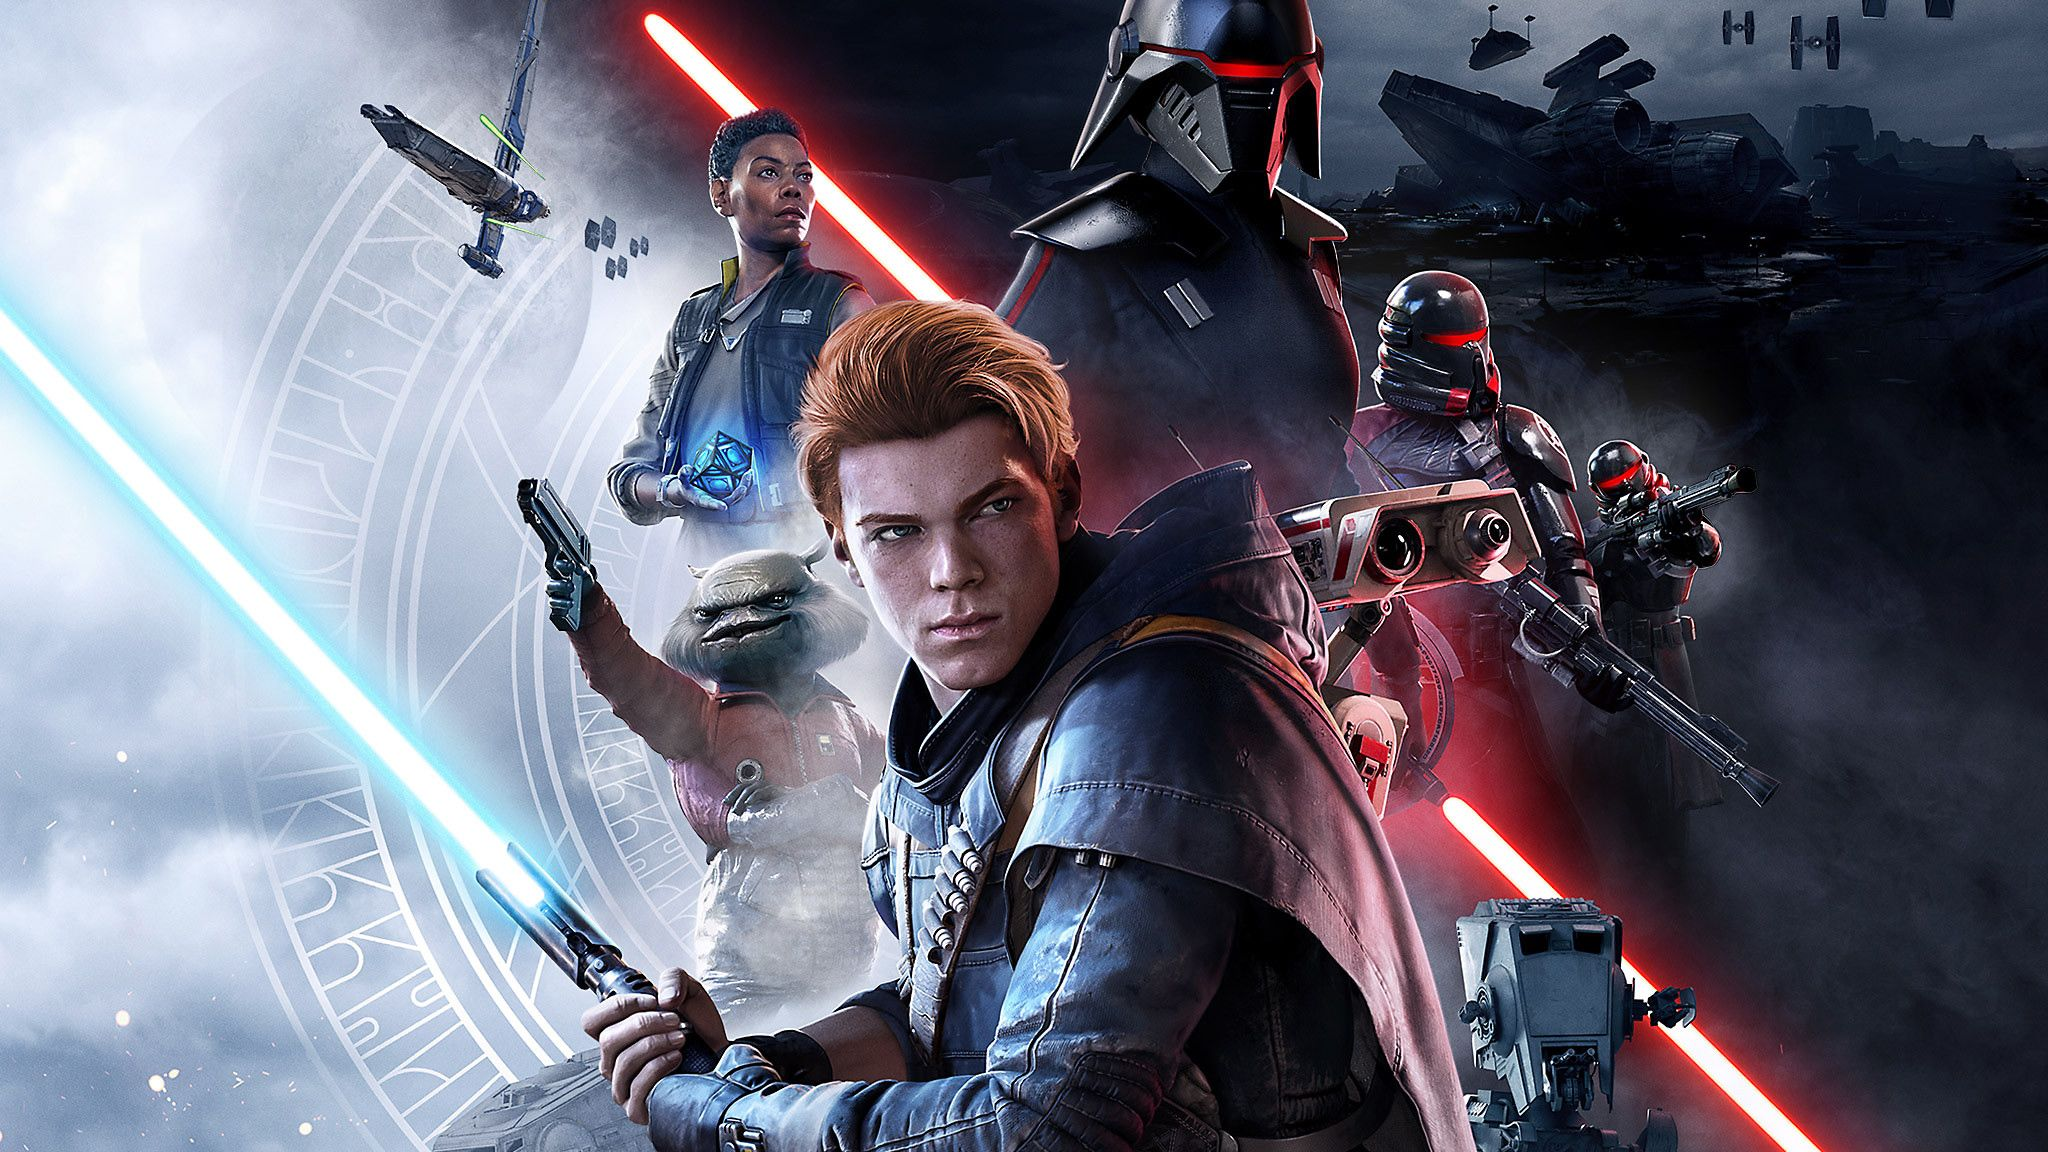 Постер Star Wars Jedi: Fallen Order